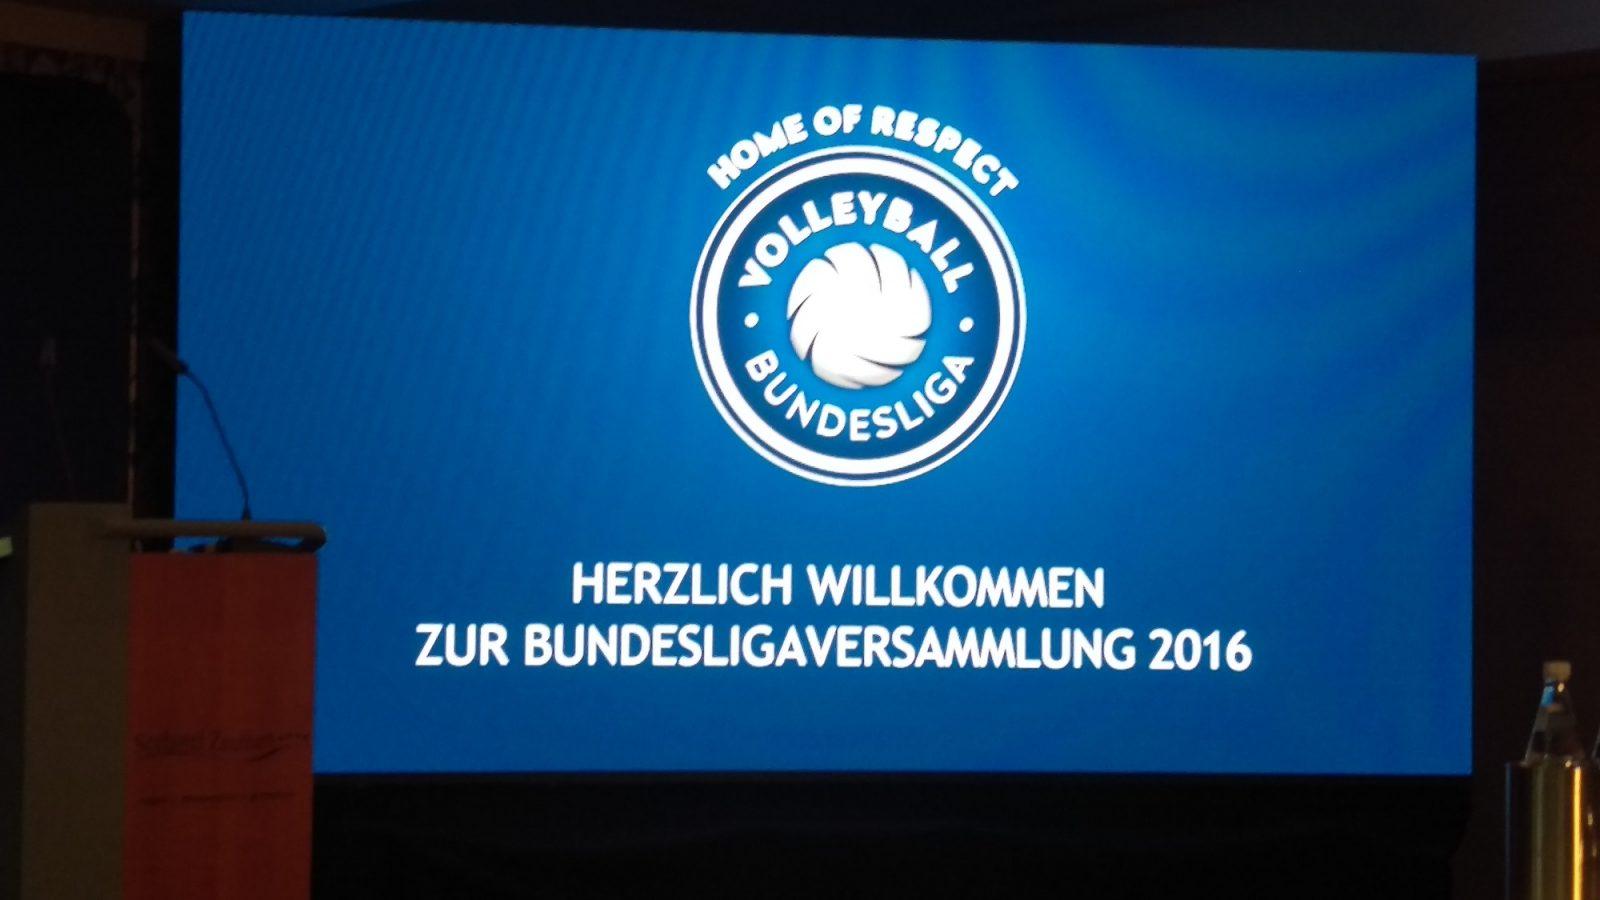 Volleyball-Bundesligaversammlung 2016